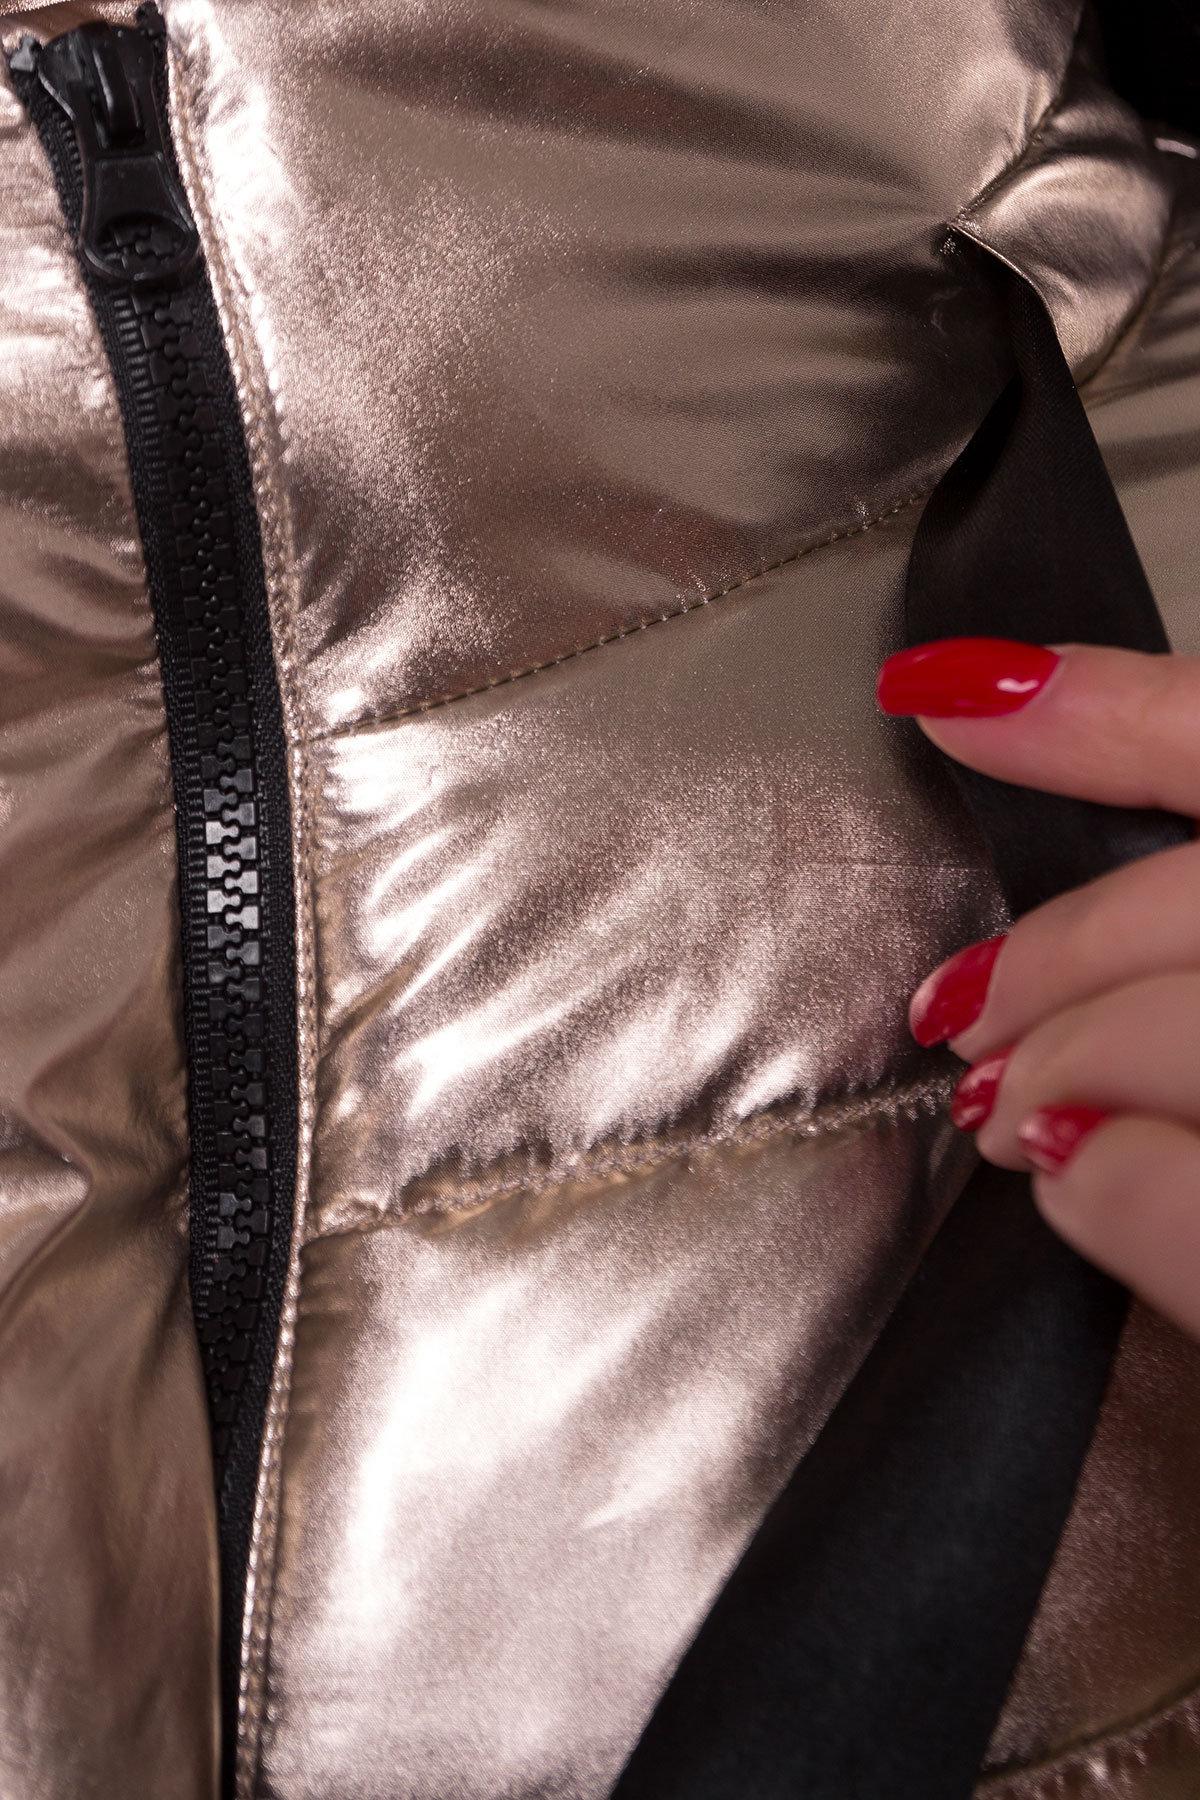 Куртка металлик Эллария 4589 АРТ. 21749 Цвет: Золото - фото 5, интернет магазин tm-modus.ru